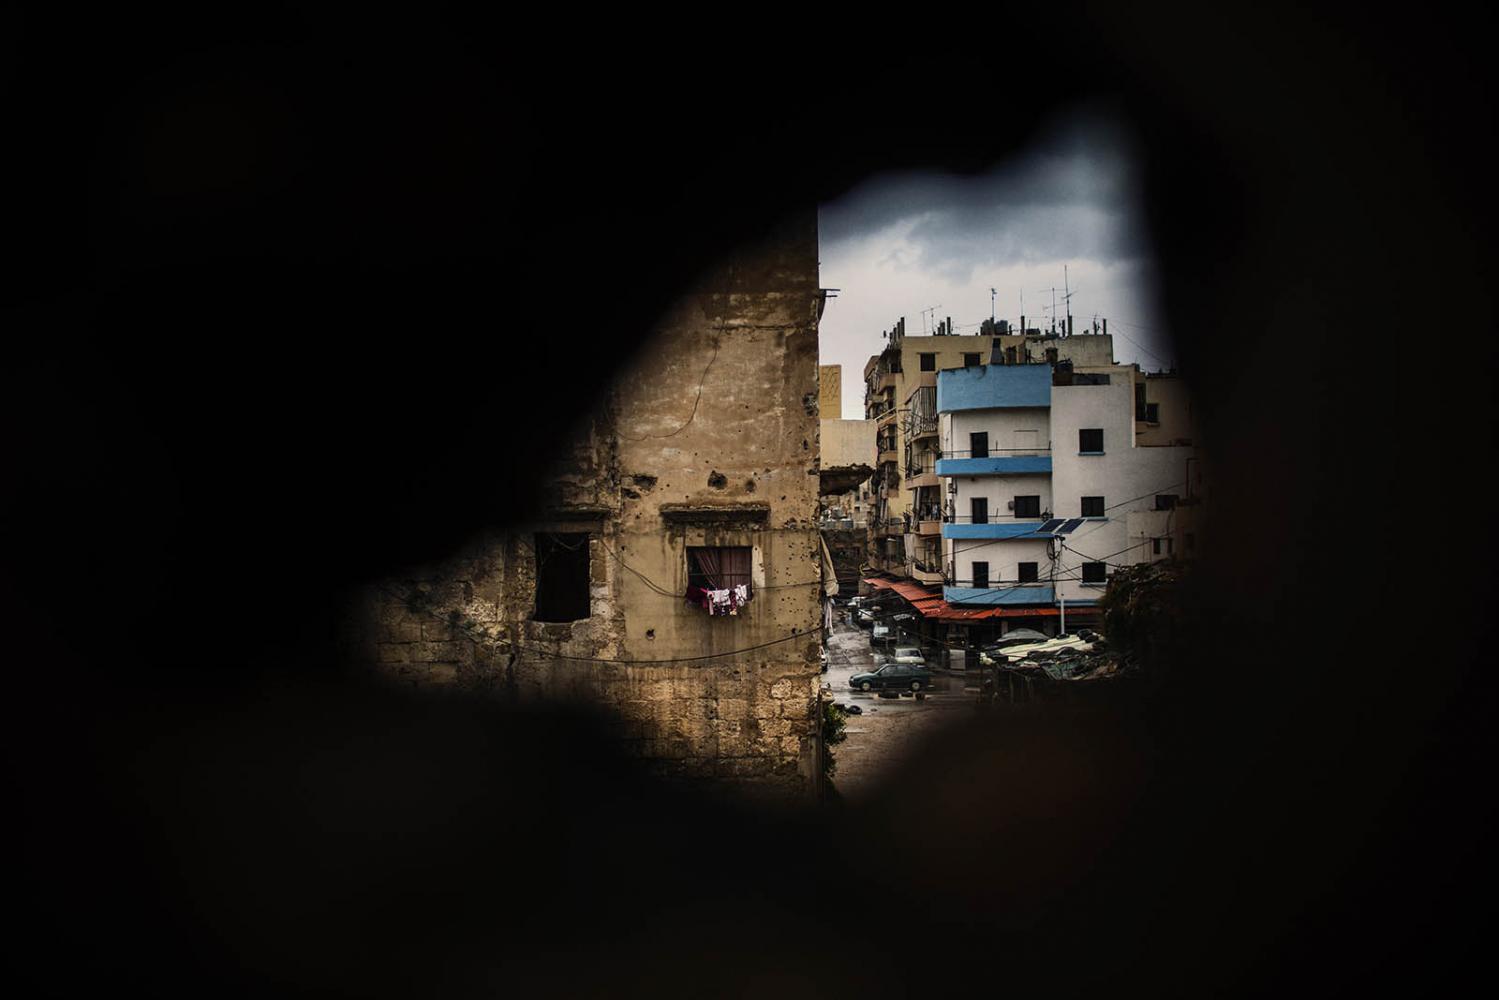 Photography image - Loading Tripoli-Nzz-003.jpg